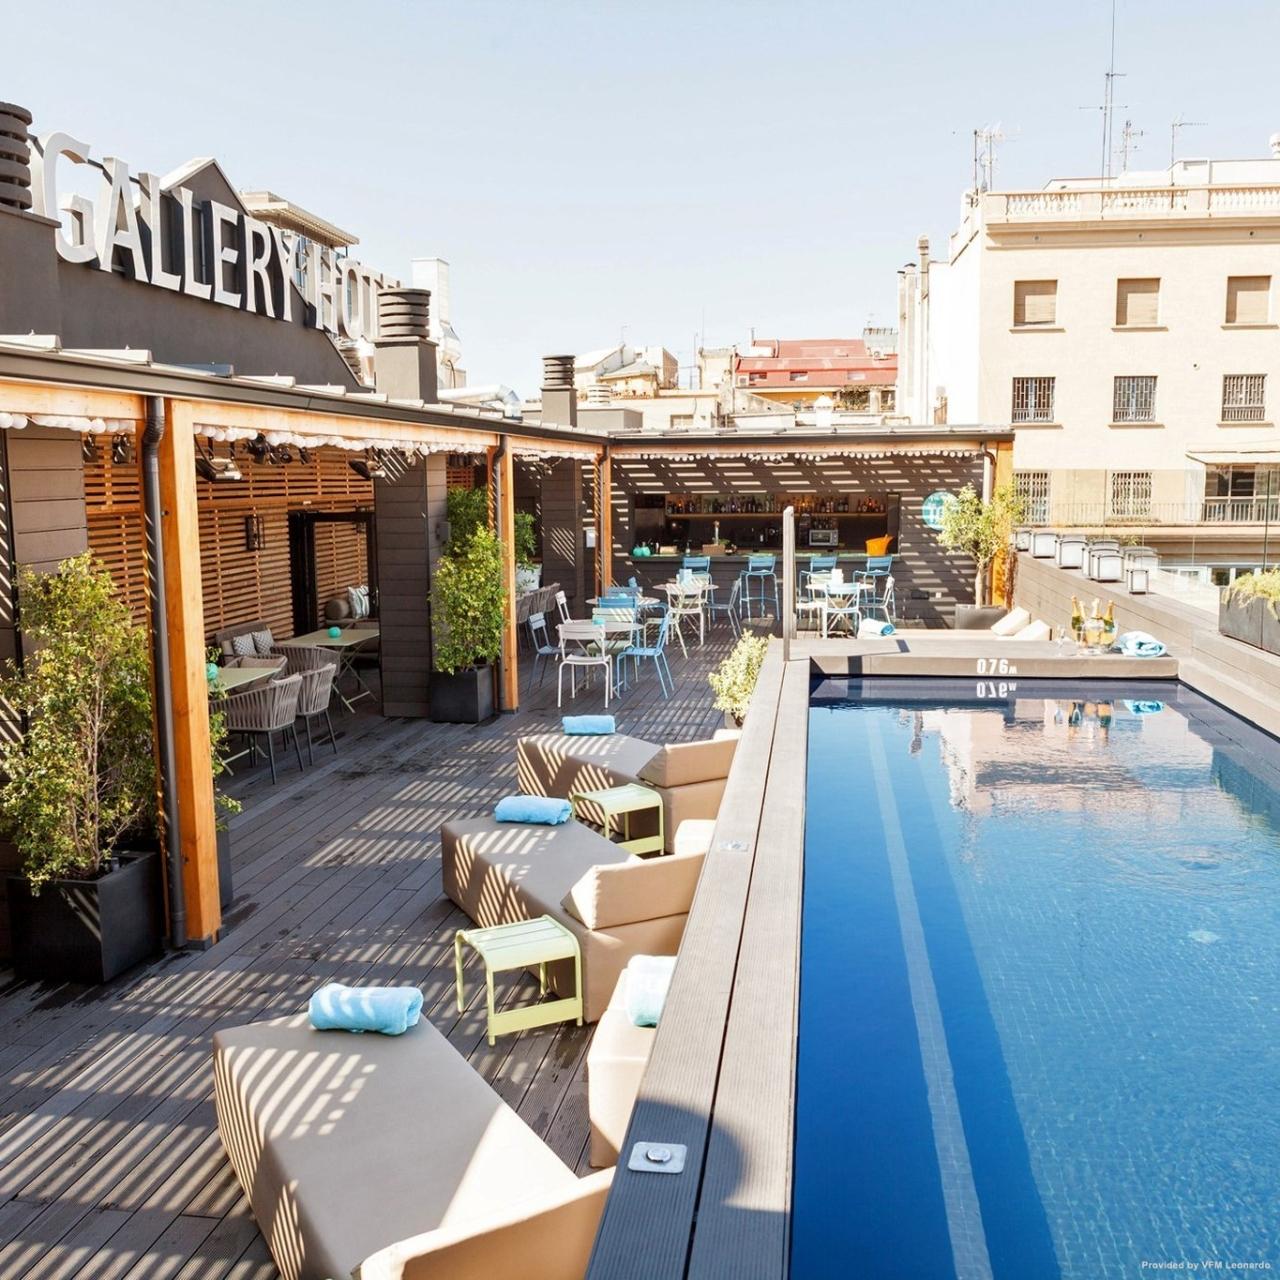 Barcelona: 2 Nächte - 4*Gallery Hotel - Doppelzimmer inkl. Frühstück, Upgrade, Late Check-Out / gratis Storno / Juni ´21 bis April ´22